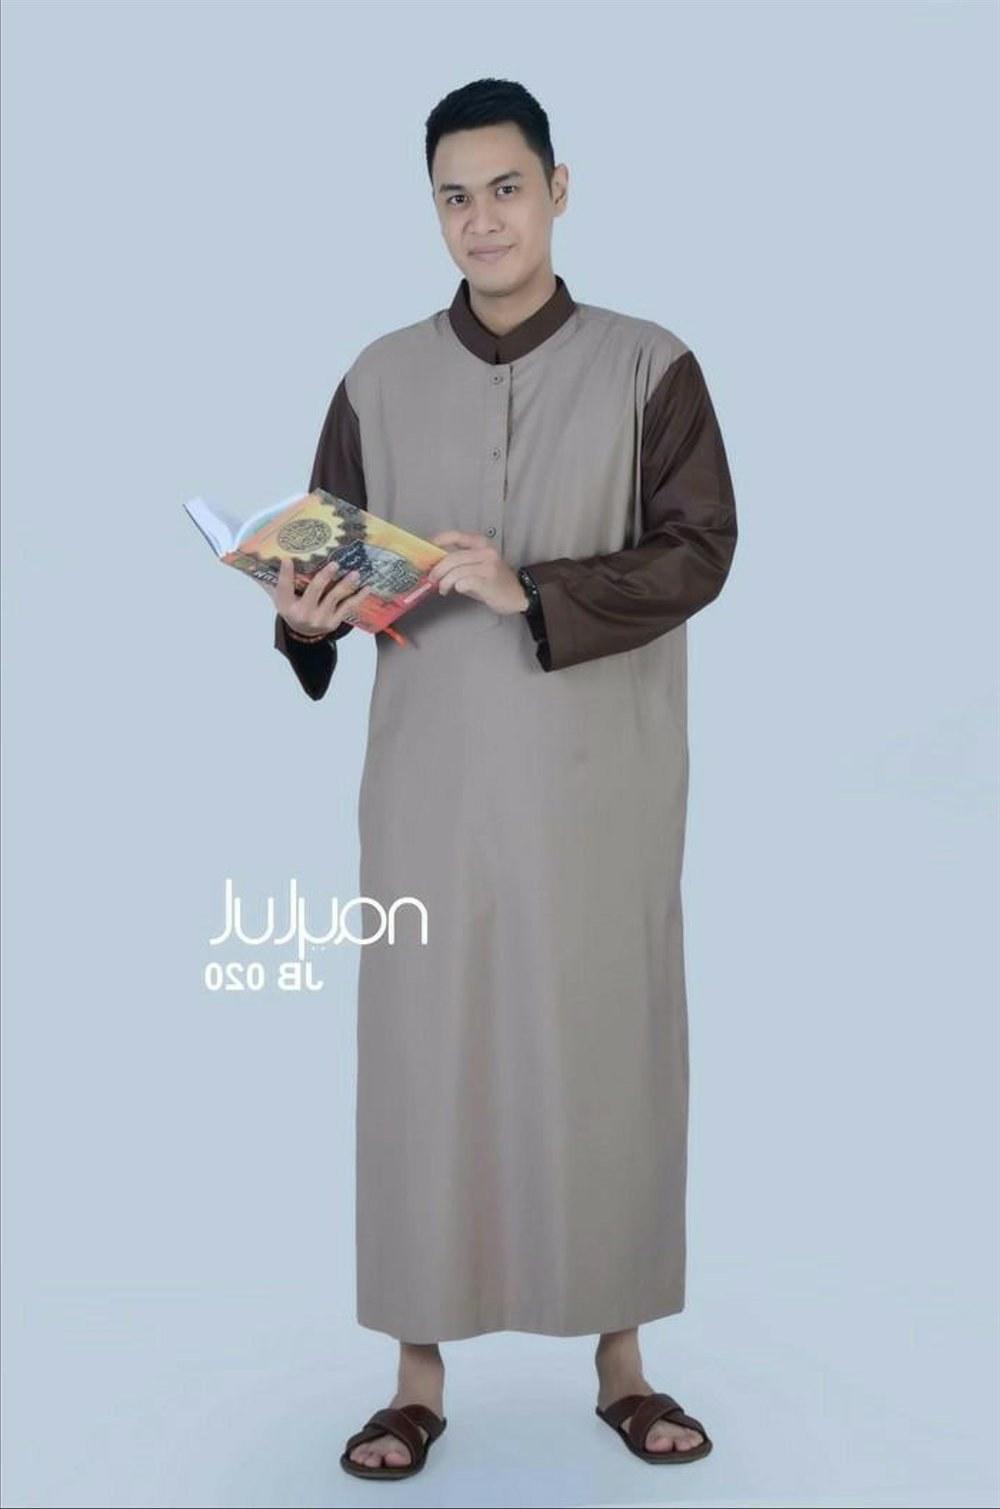 Design Baju Pengantin Muslimah Rabbani Budm Camera Camera